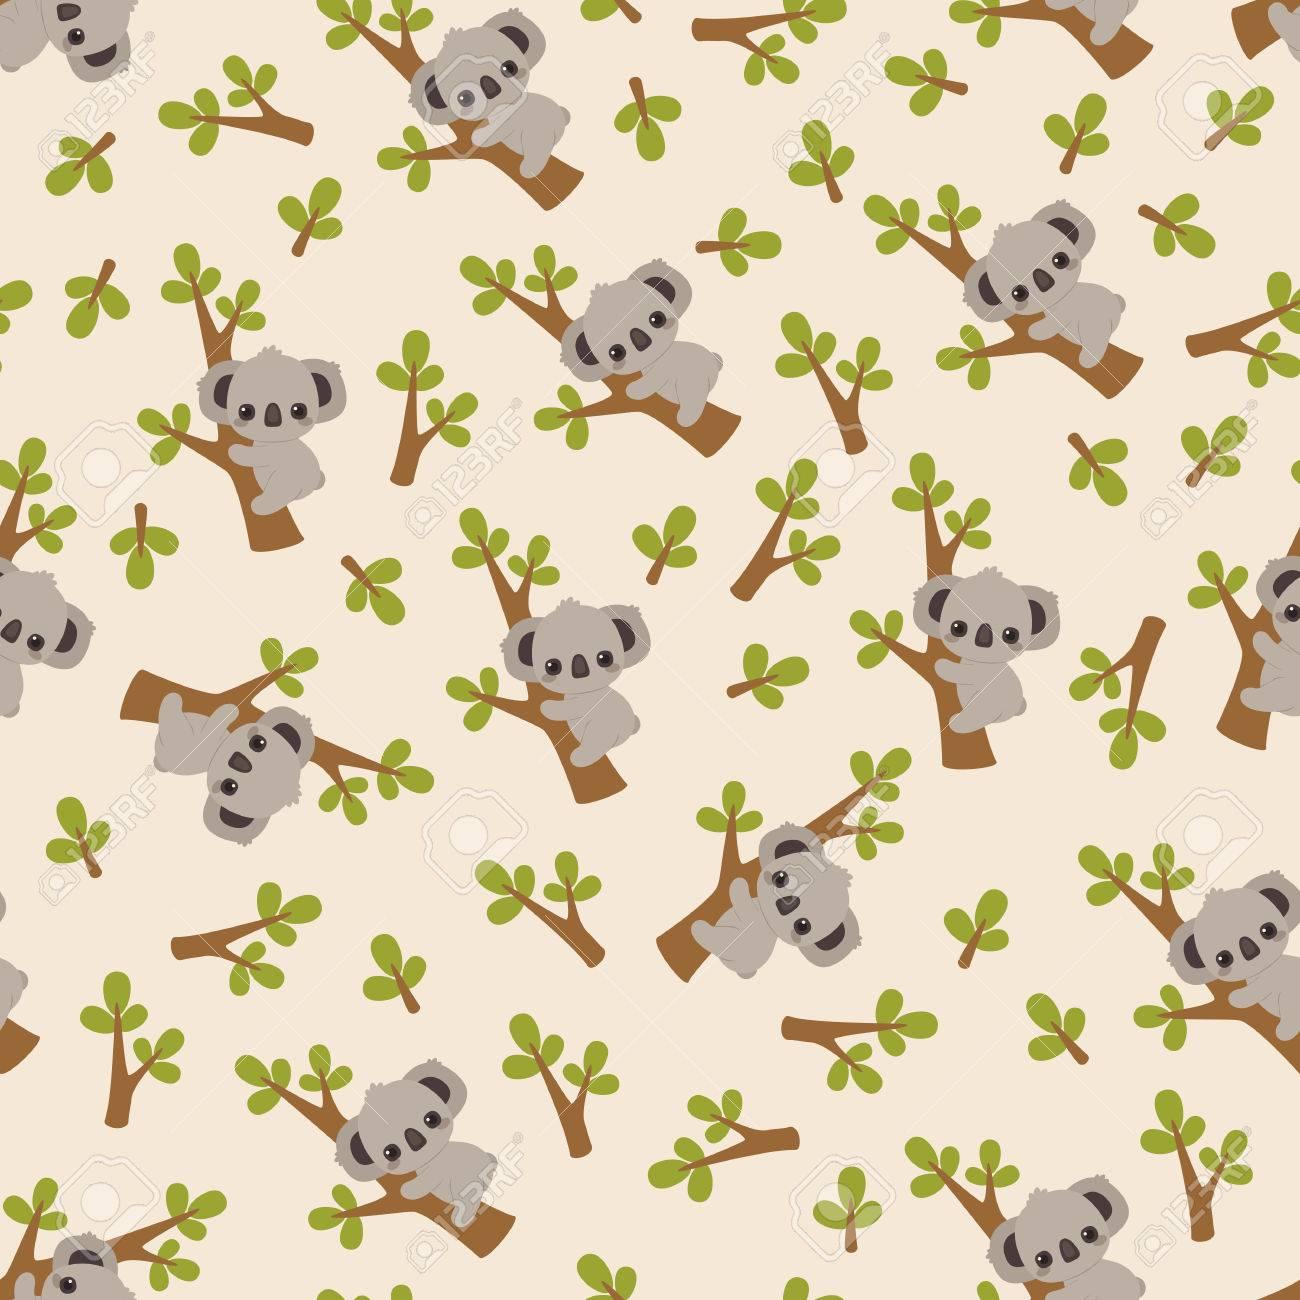 Cute Cartoon Koala On A Tree Pattern Wallpaper Royalty Free Cliparts